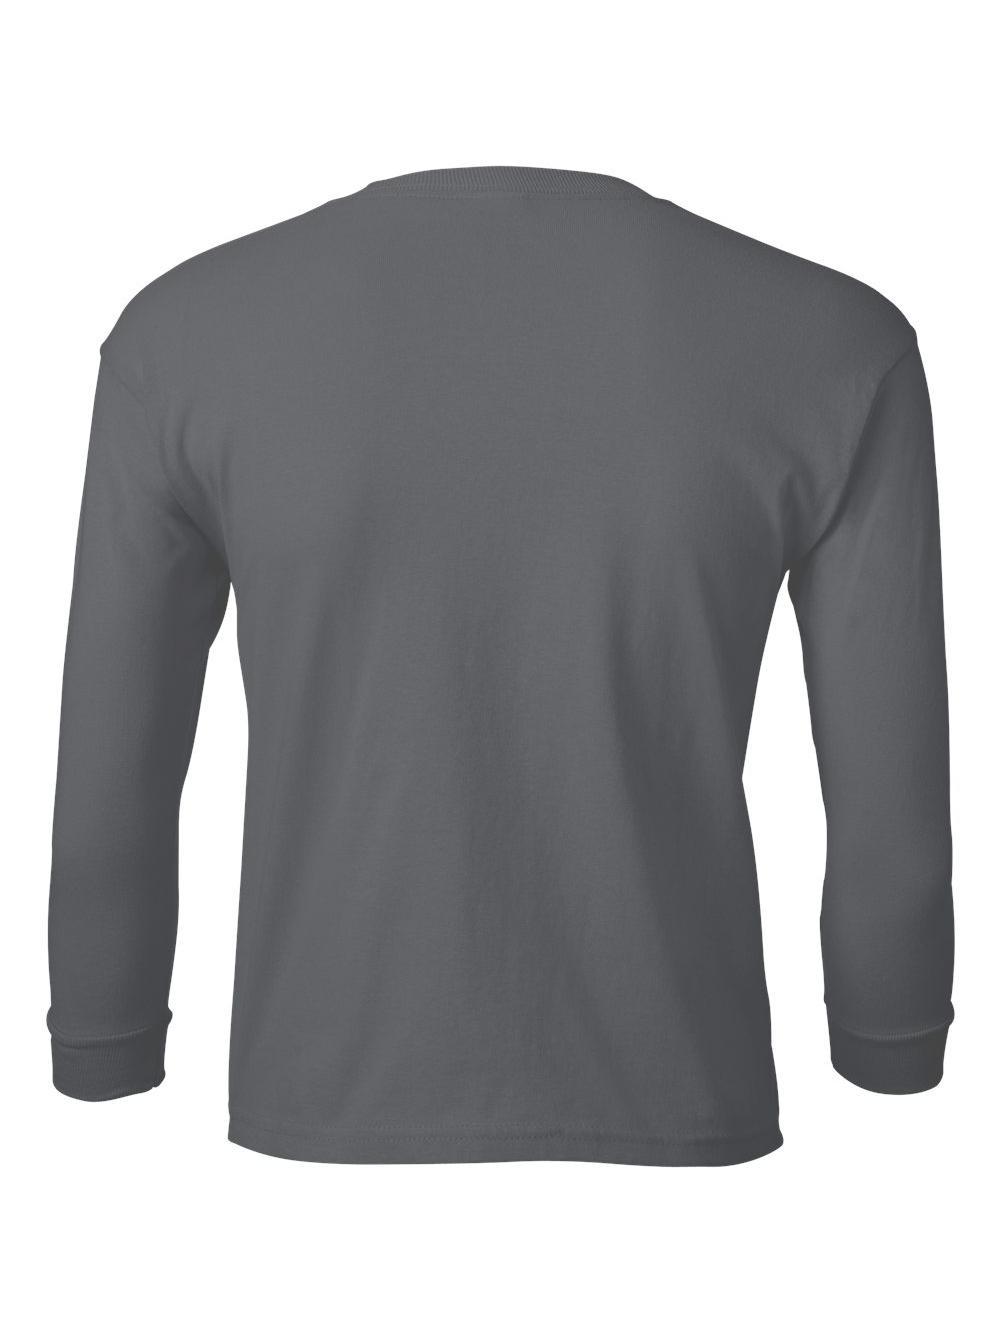 Gildan-Ultra-Cotton-Youth-Long-Sleeve-T-Shirt-2400B thumbnail 10